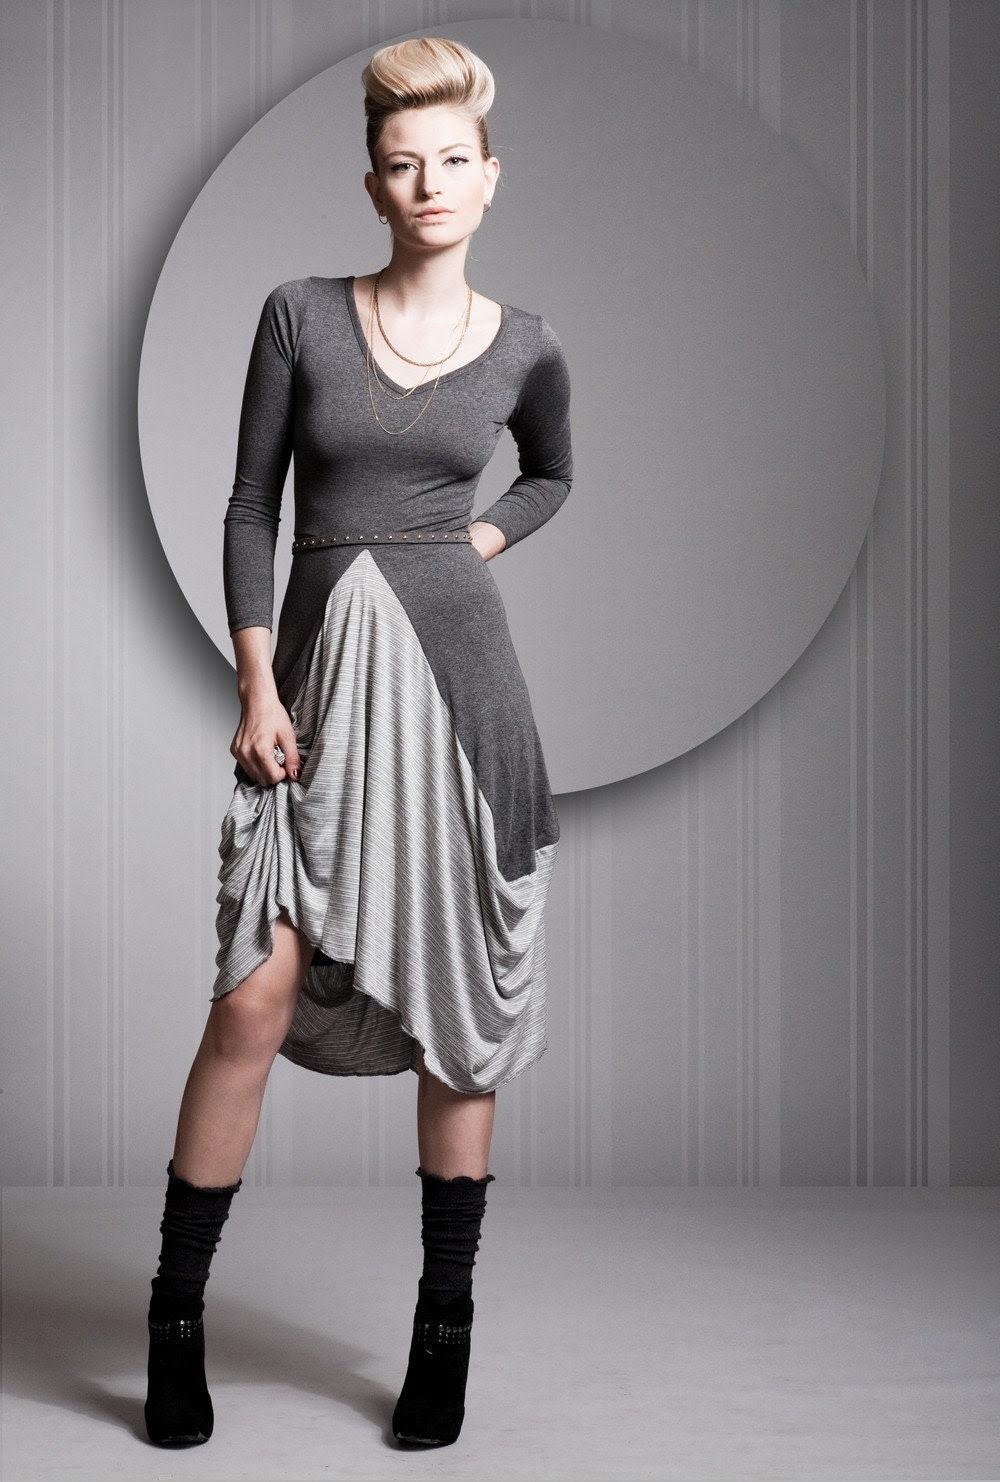 Grey Dress, Gray Dress, Cotton Lycra Dress, Long Sleeves Dress, Gray Robe, Any Sizes, Knee Length - Special Sale - OrliGolan